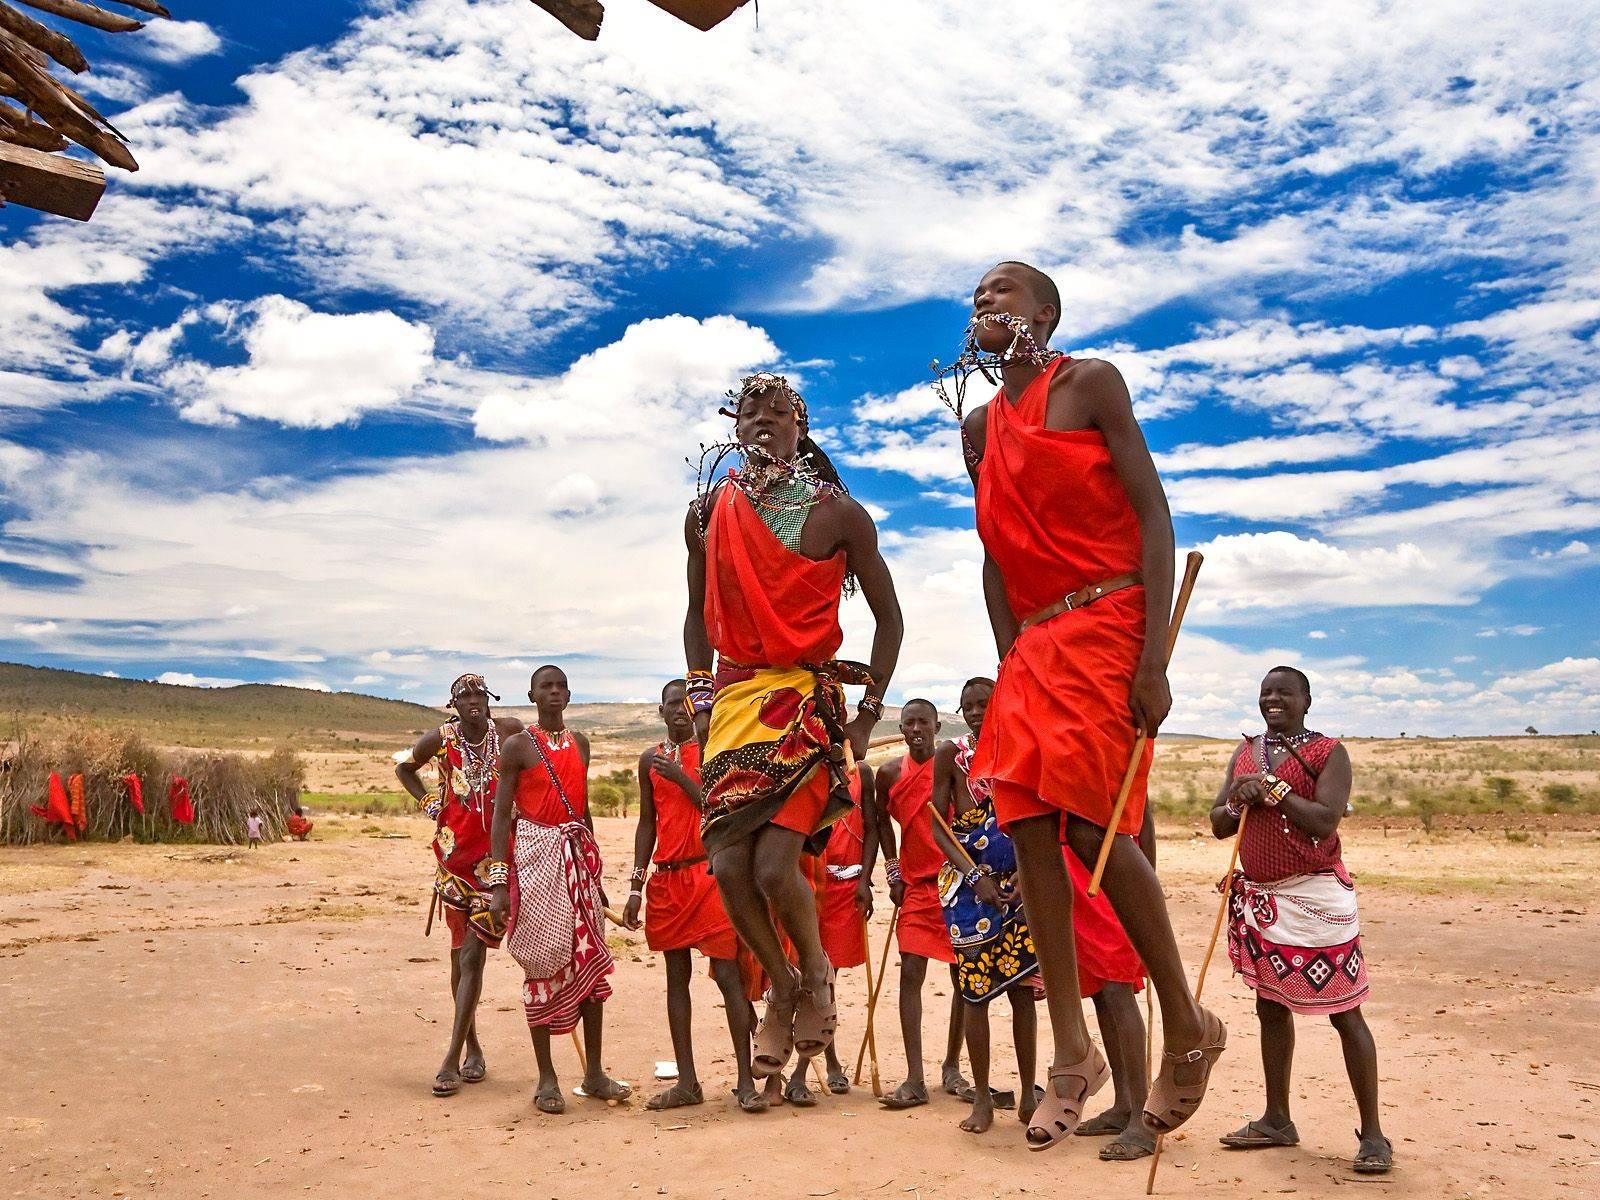 Masai sex video nsfw thumbs